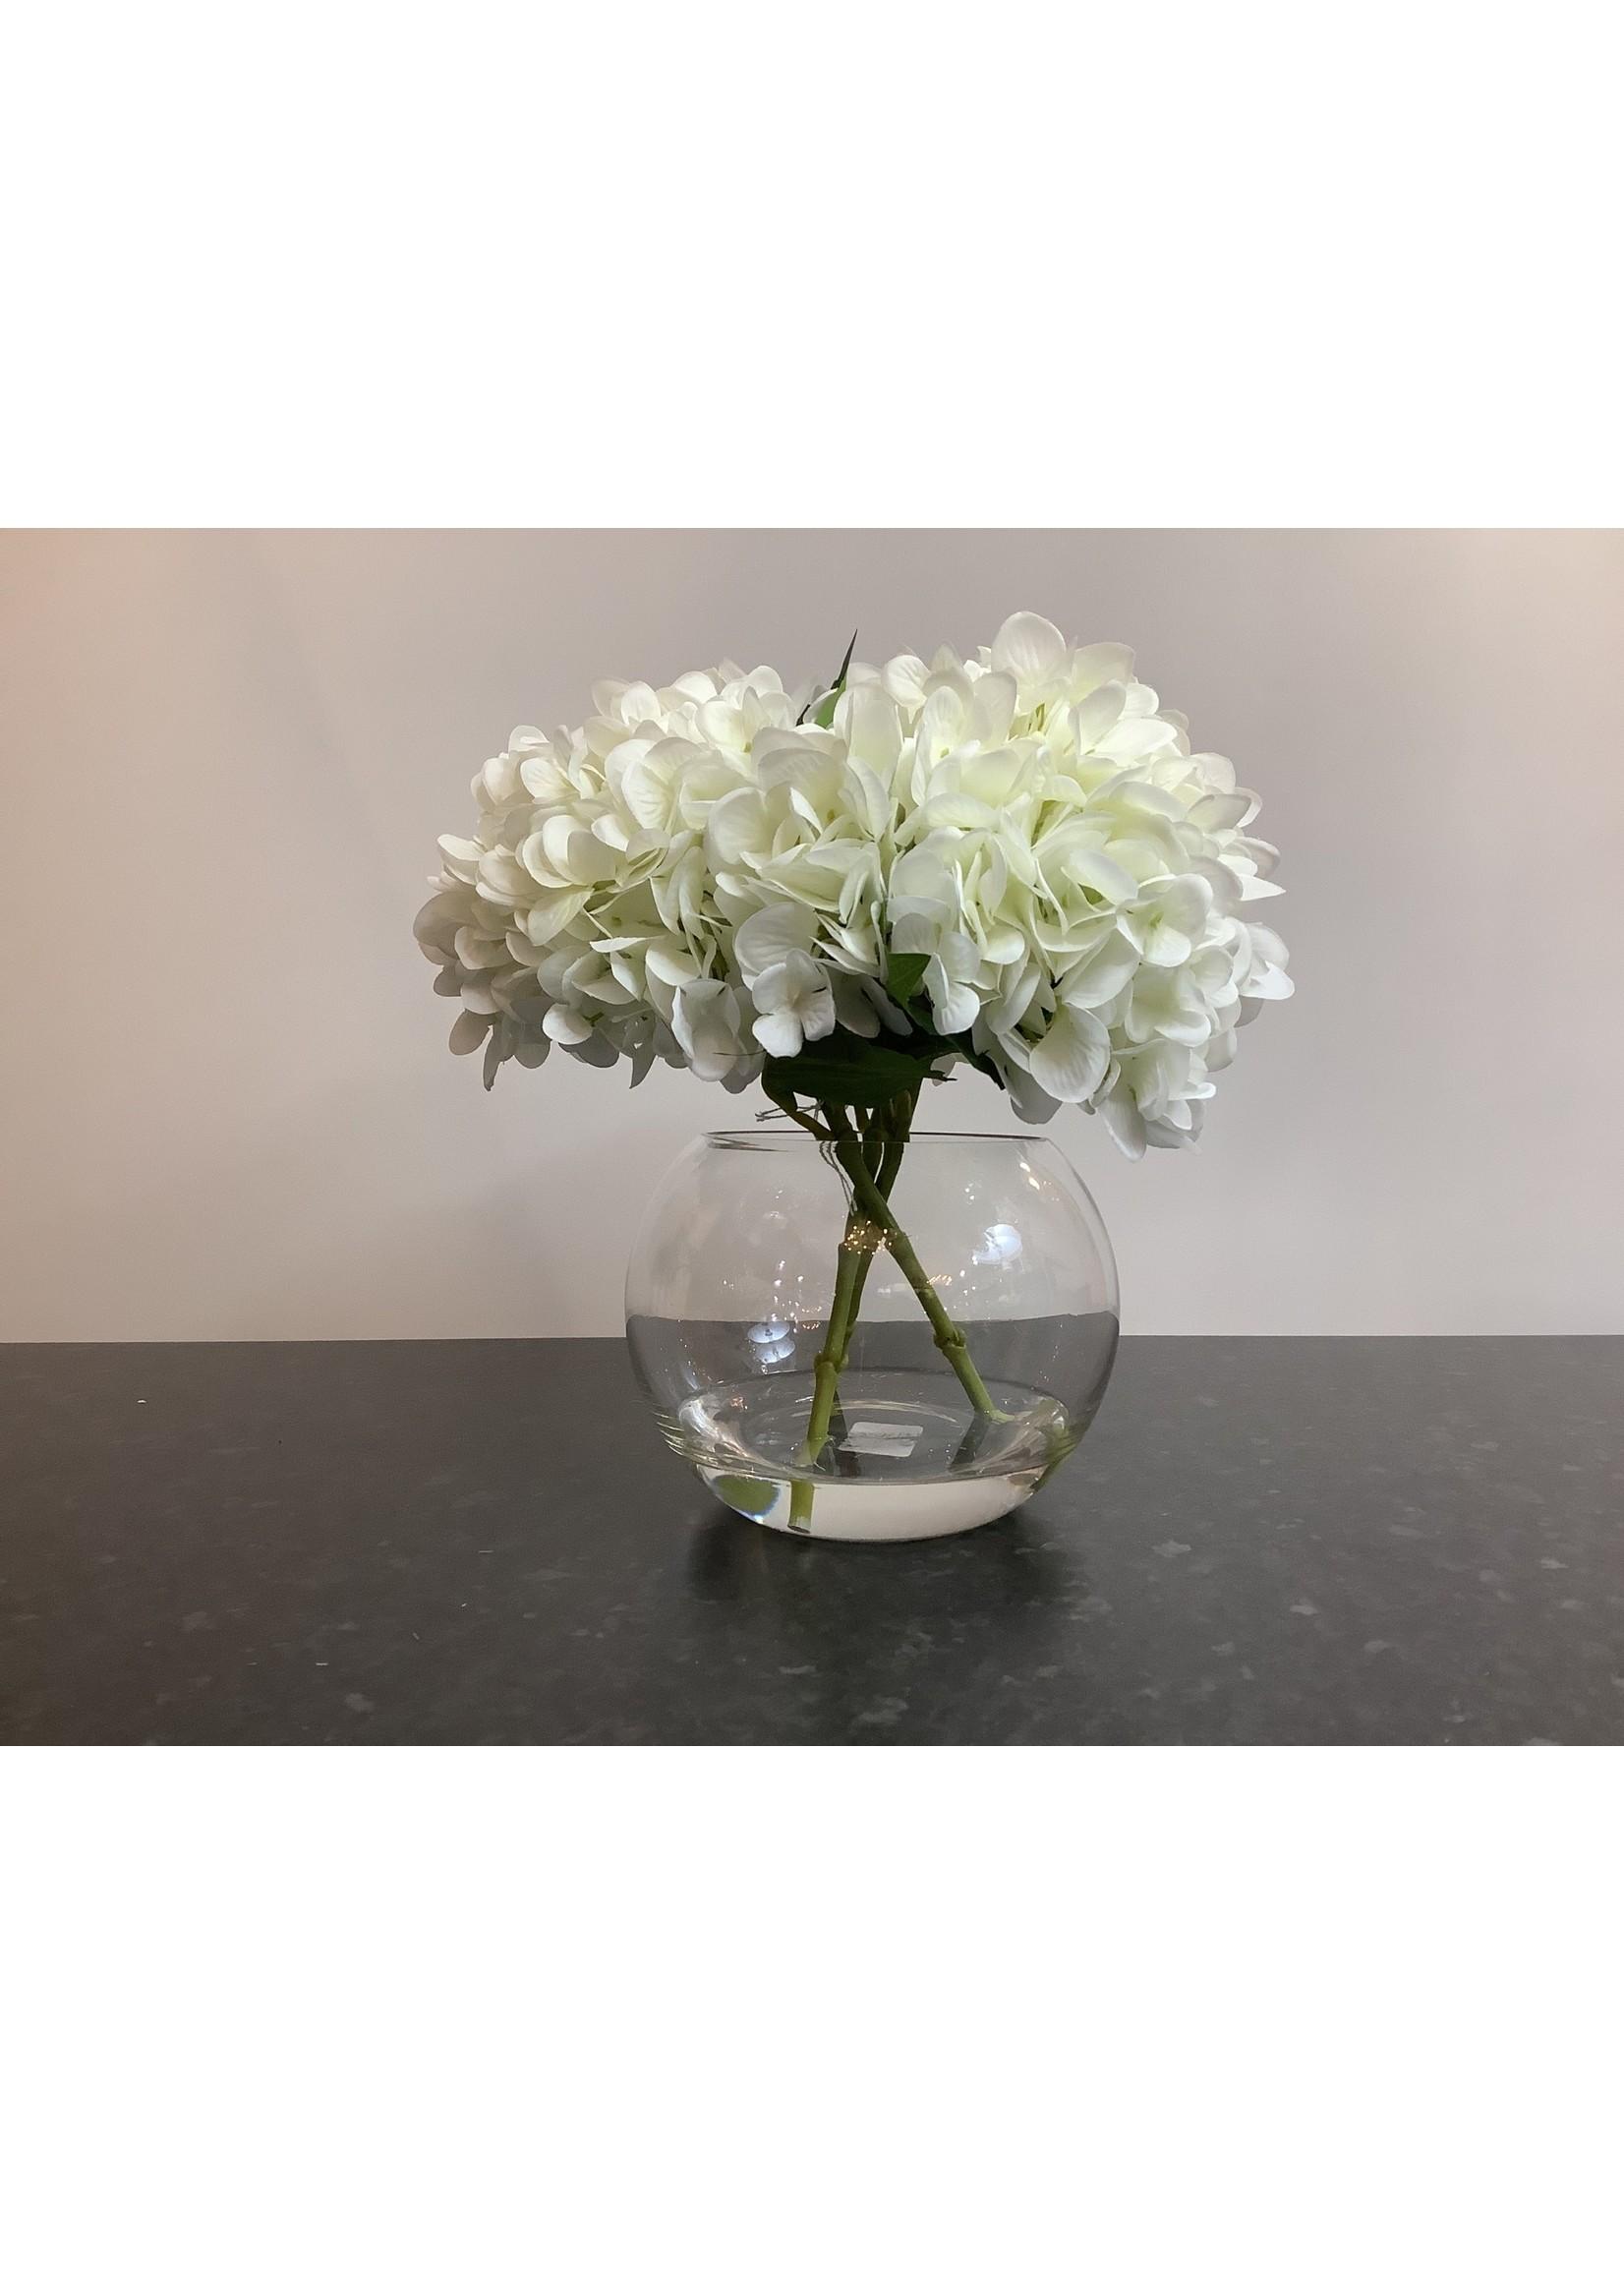 White hydrangea in globe 30x20cm